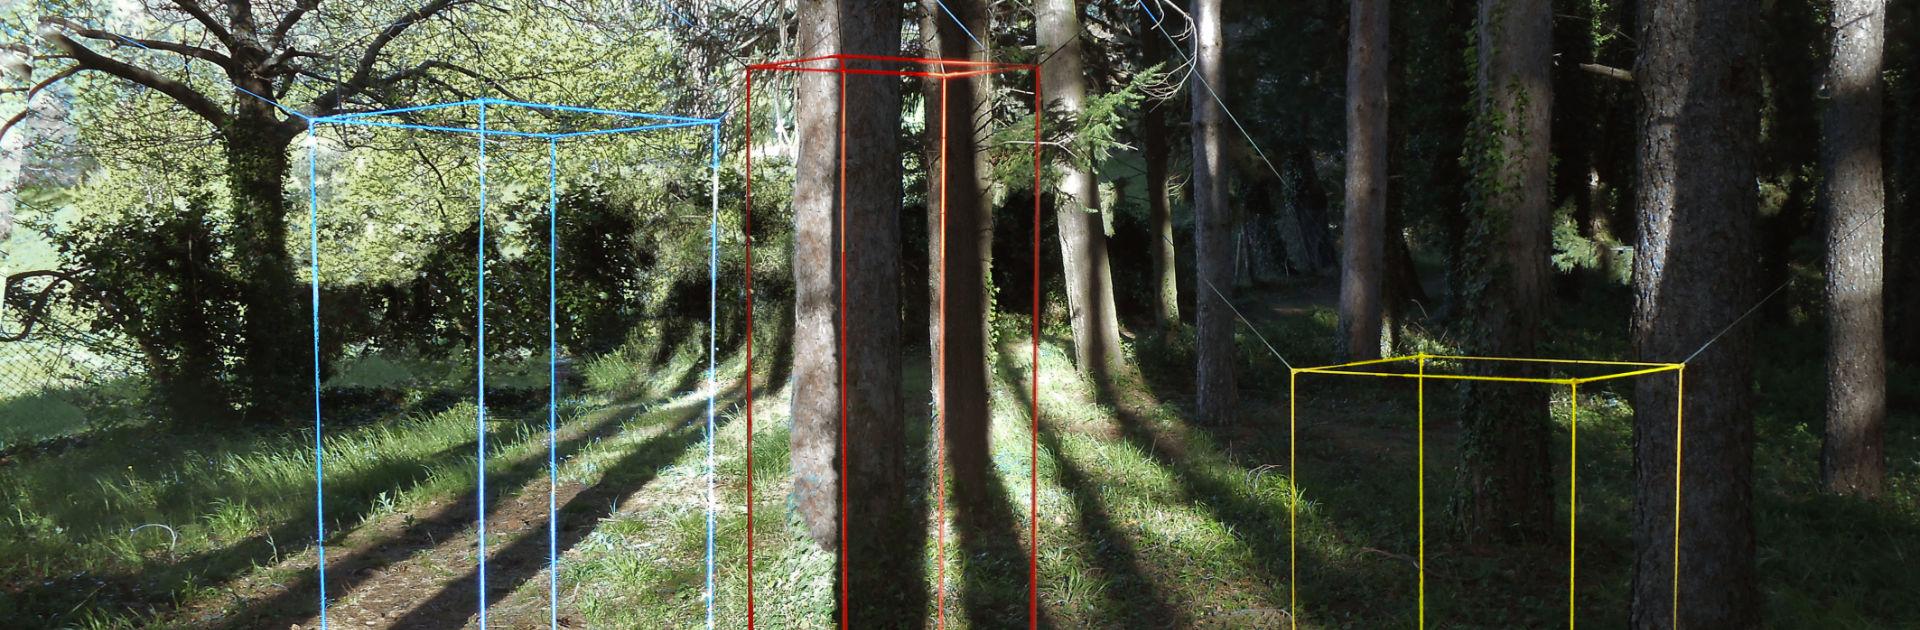 Künstlerin Nora Schoepfer im Giardino di Daniel Spoerri